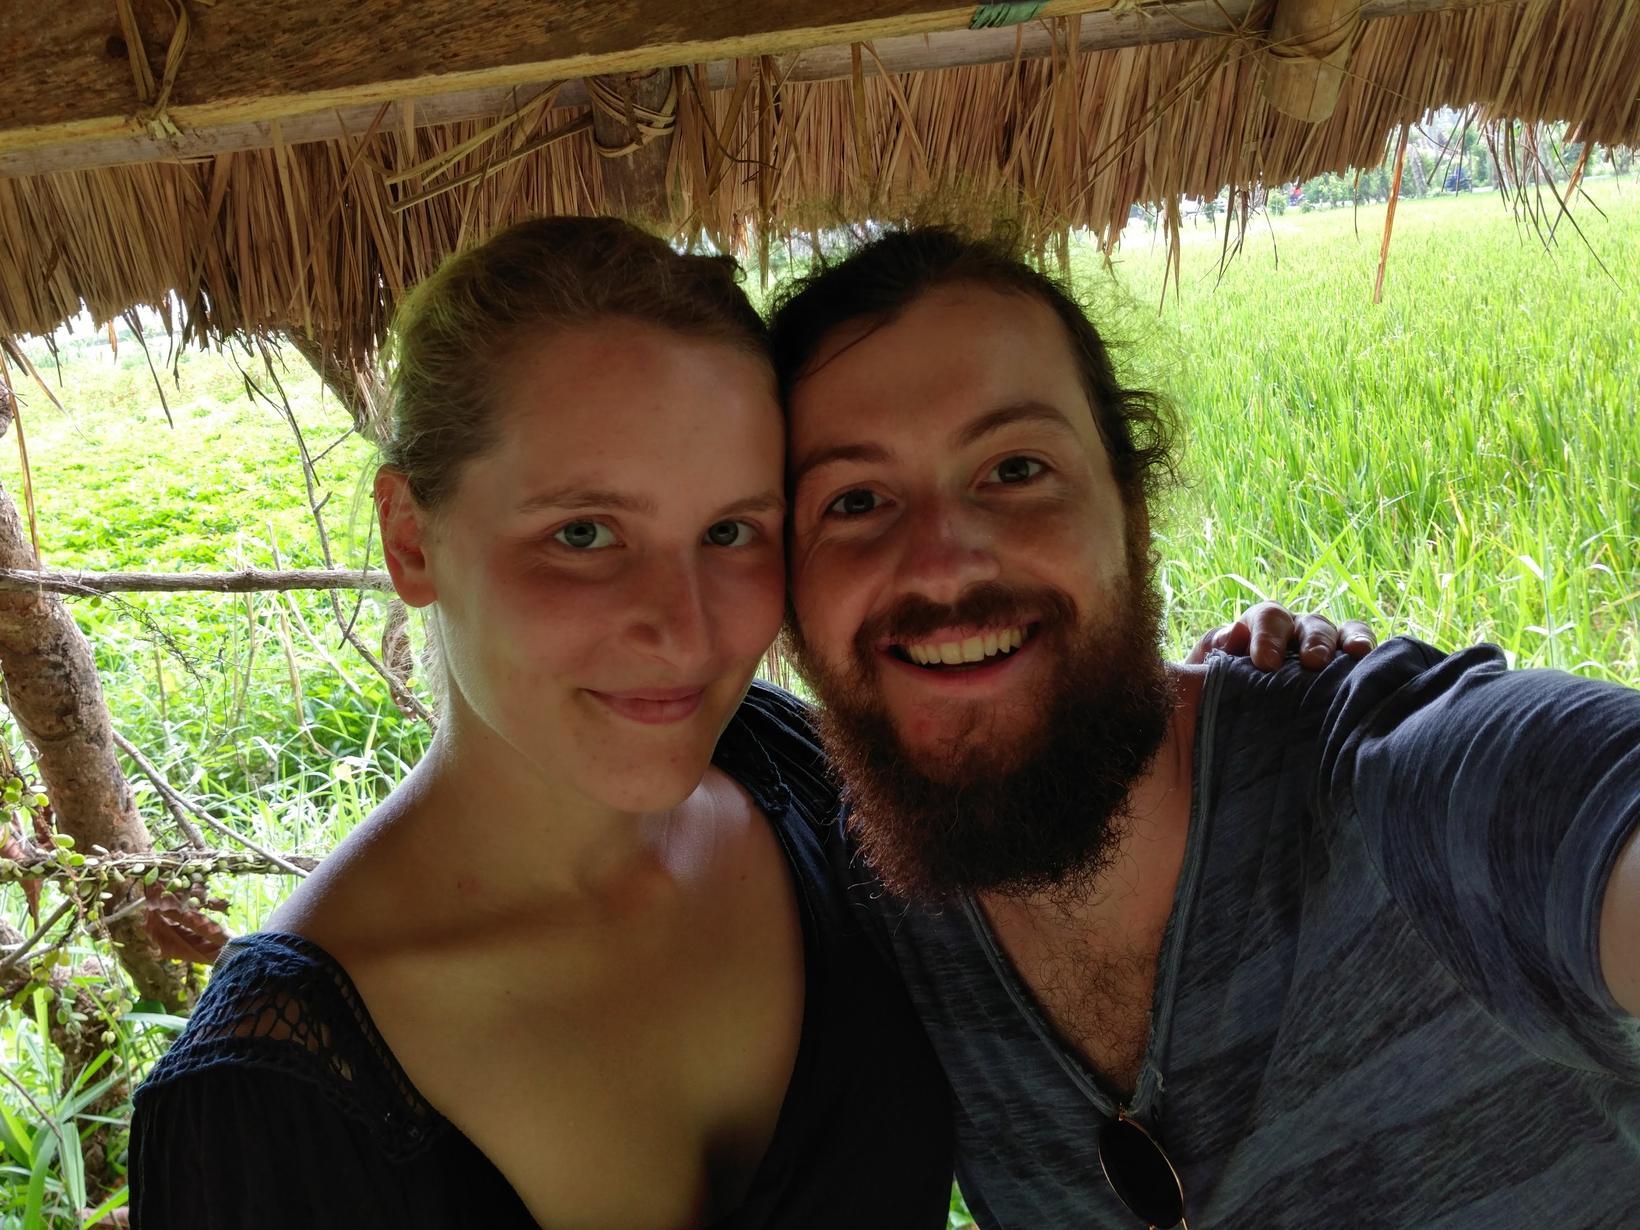 Thomas & Lena from Munich, Germany